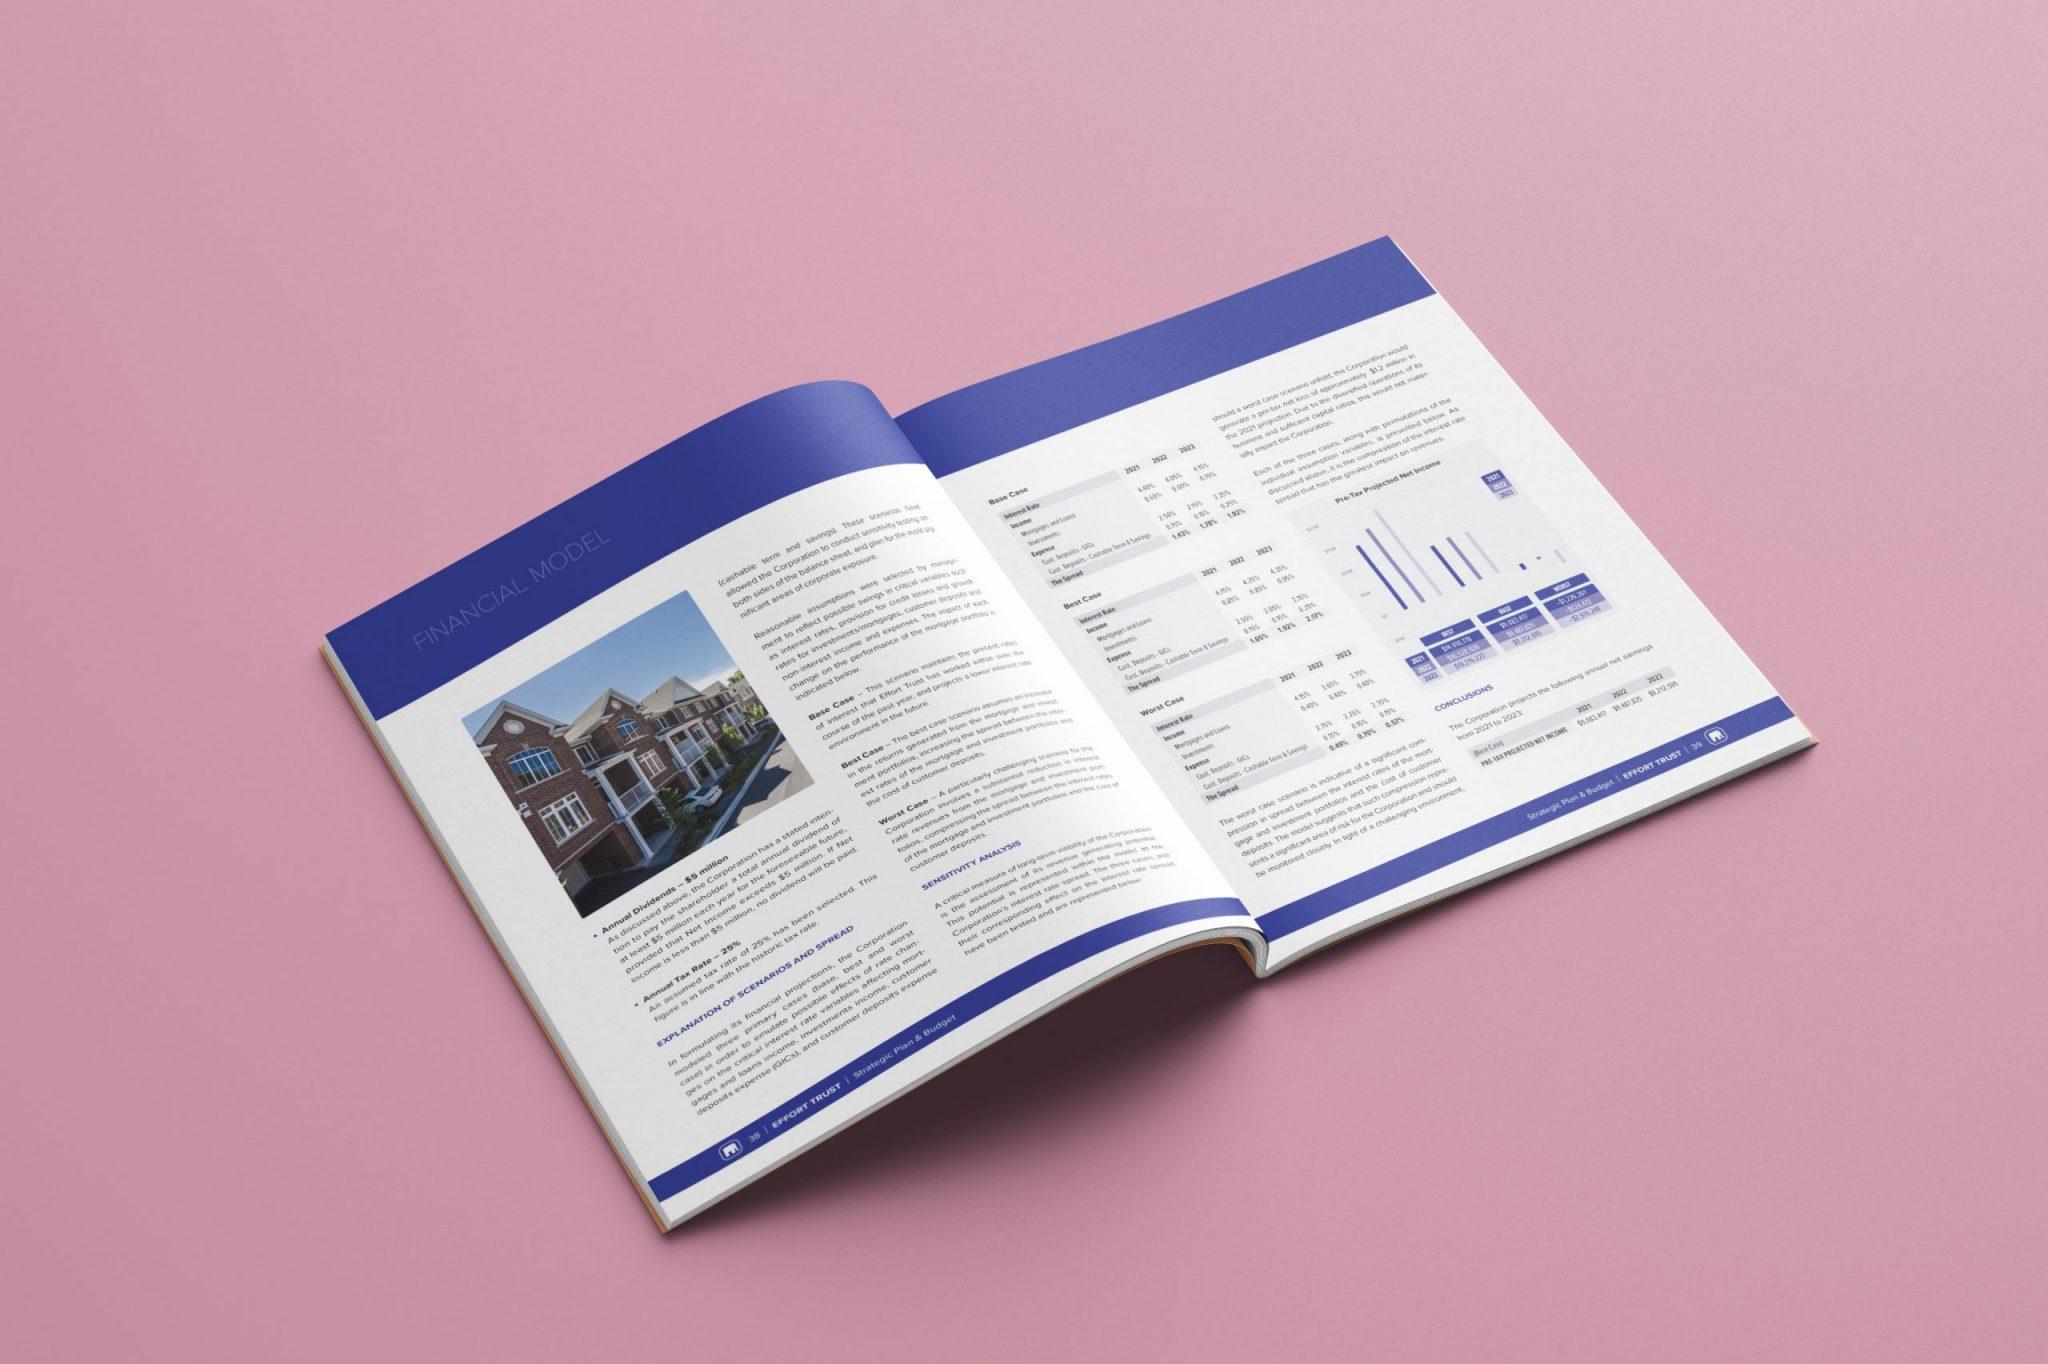 effort-trust-annual-report-spread-2-1